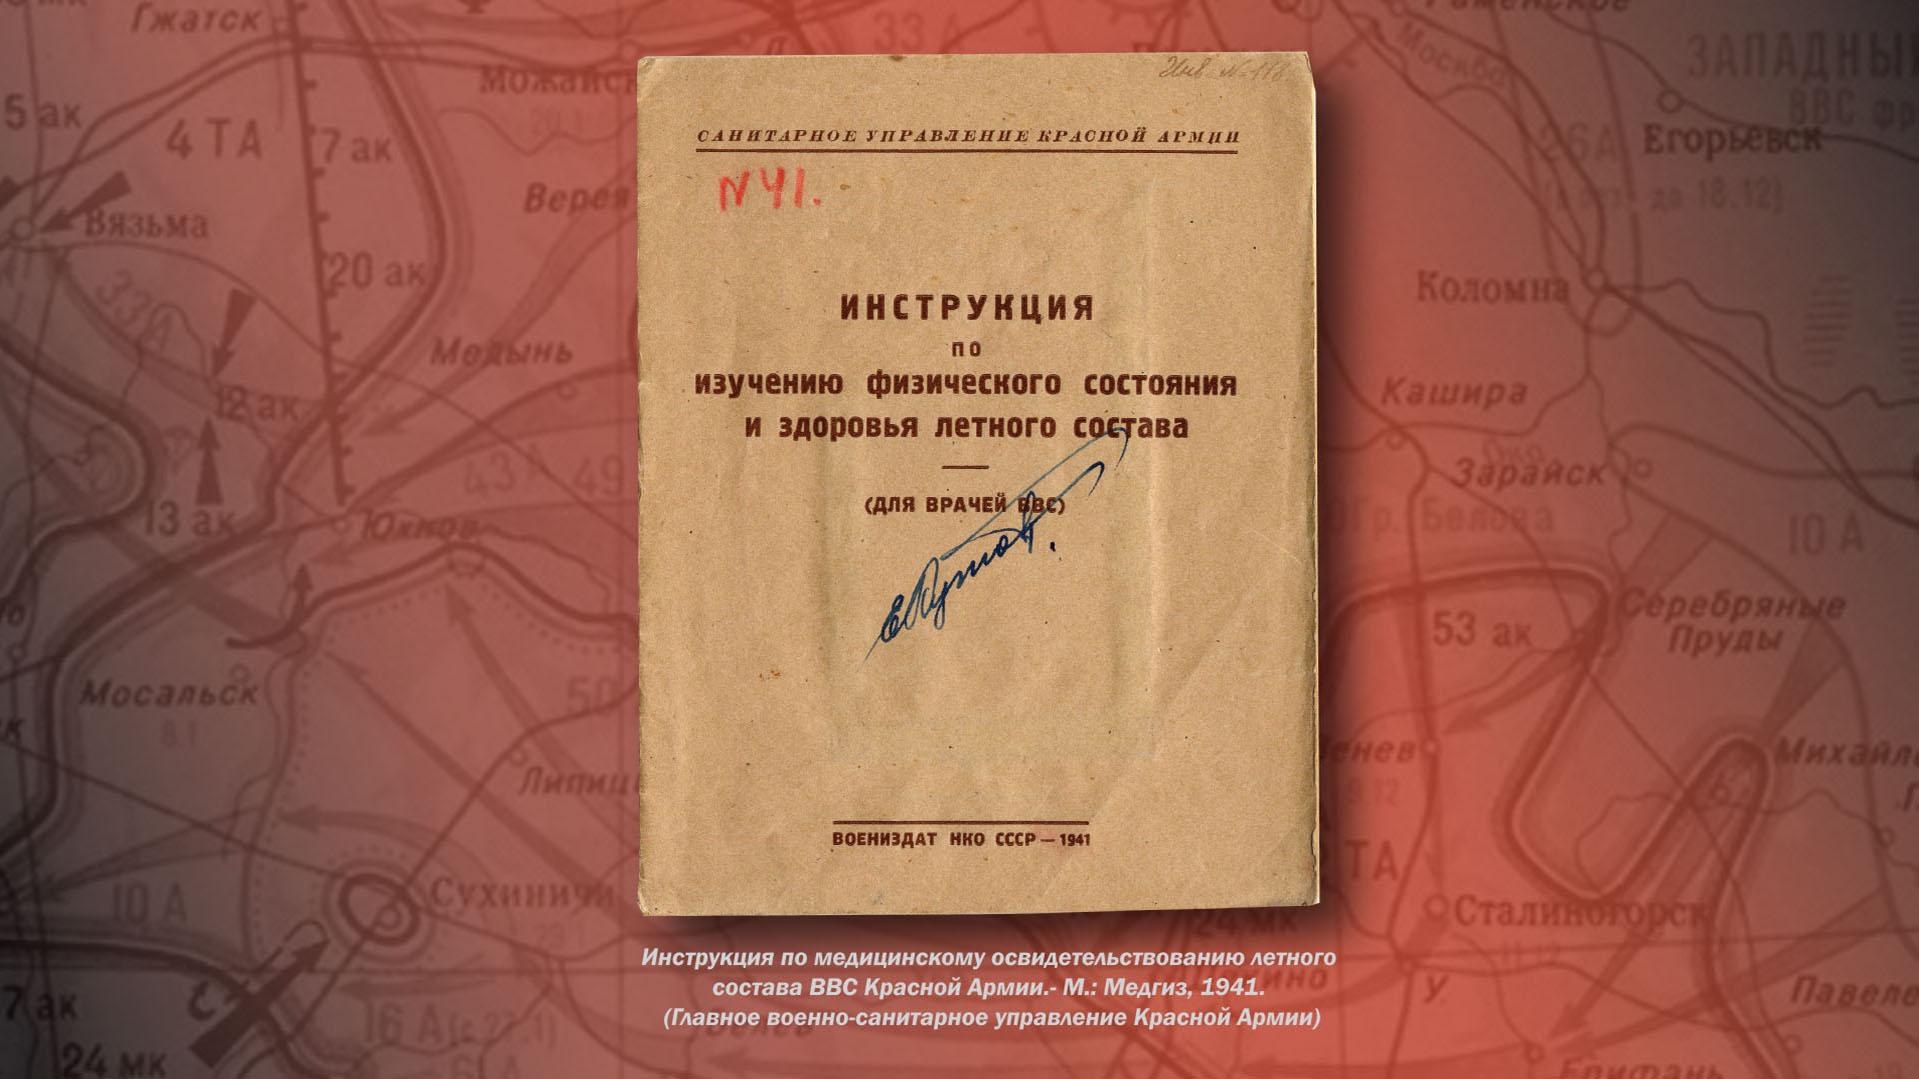 Инструкция с автографом Е.А. Карпова